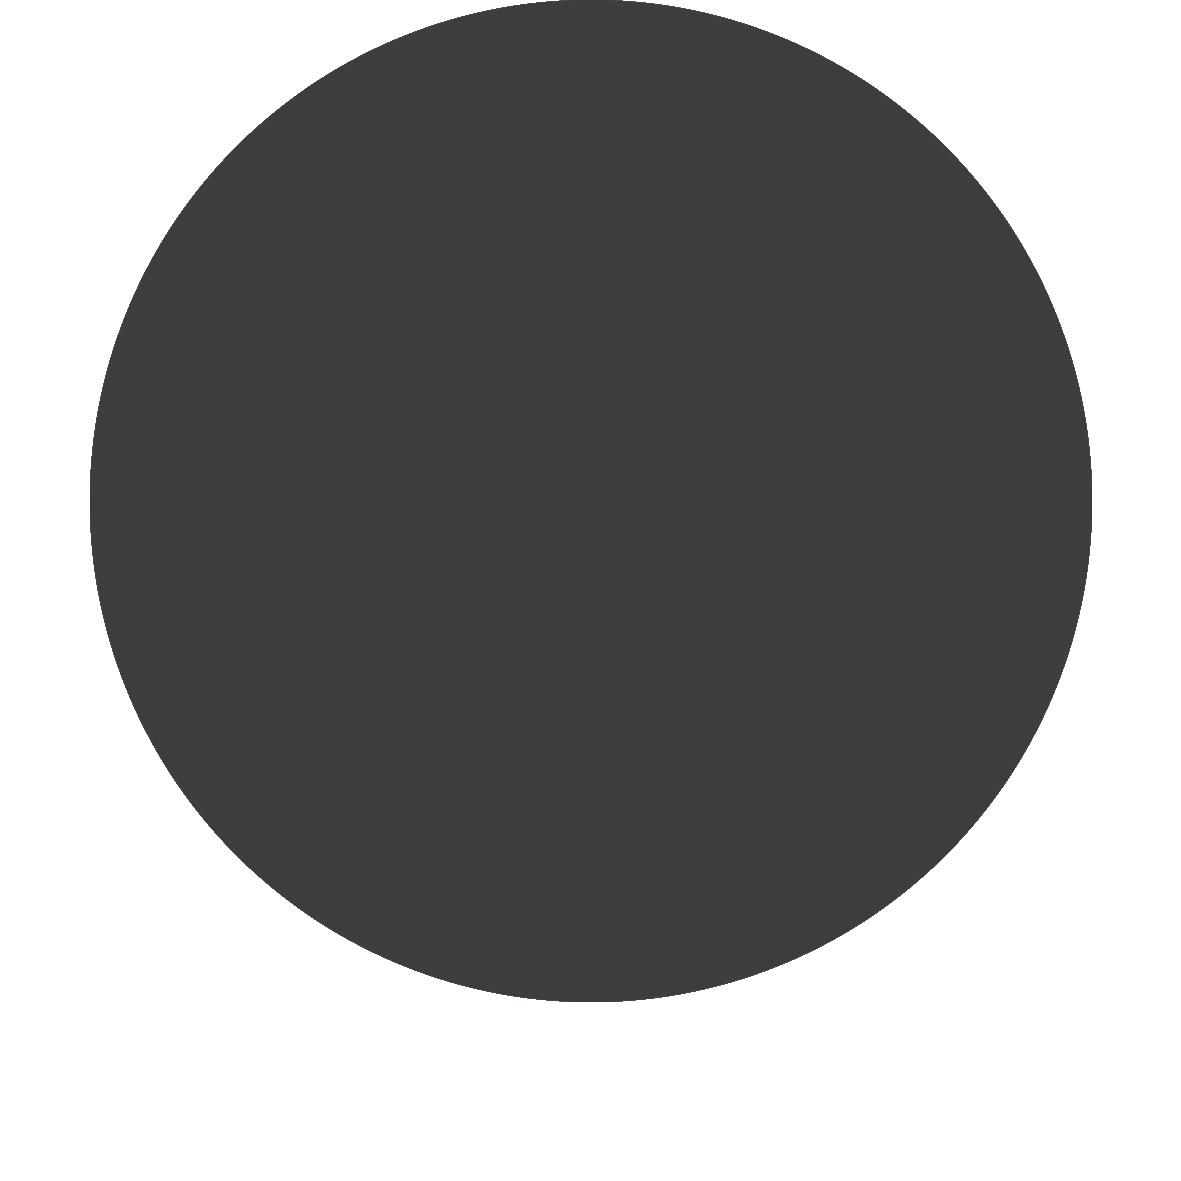 C.I. Black 7(UNL8700) -